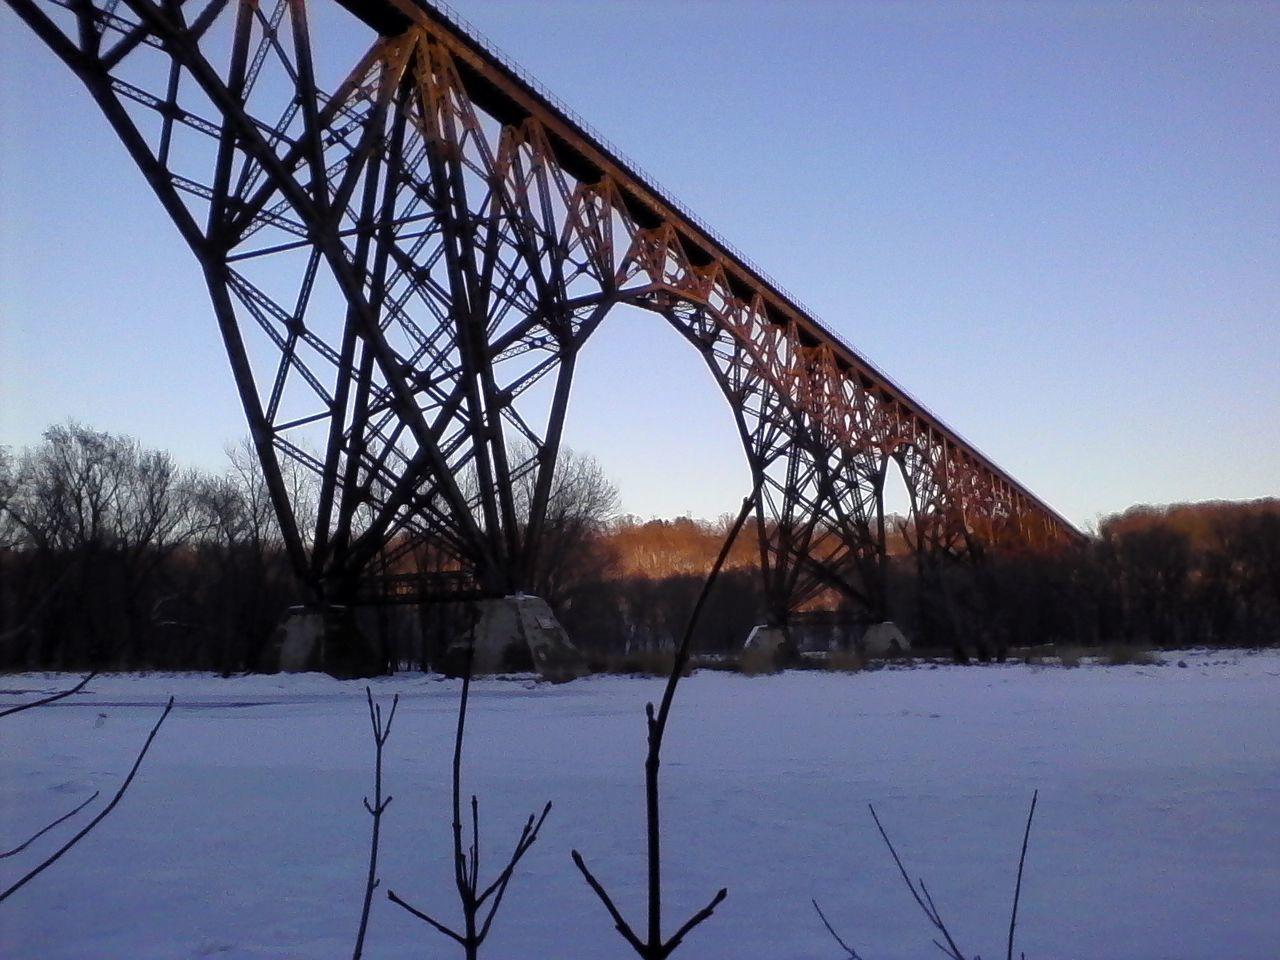 Low angle view of metallic bridge over frozen river